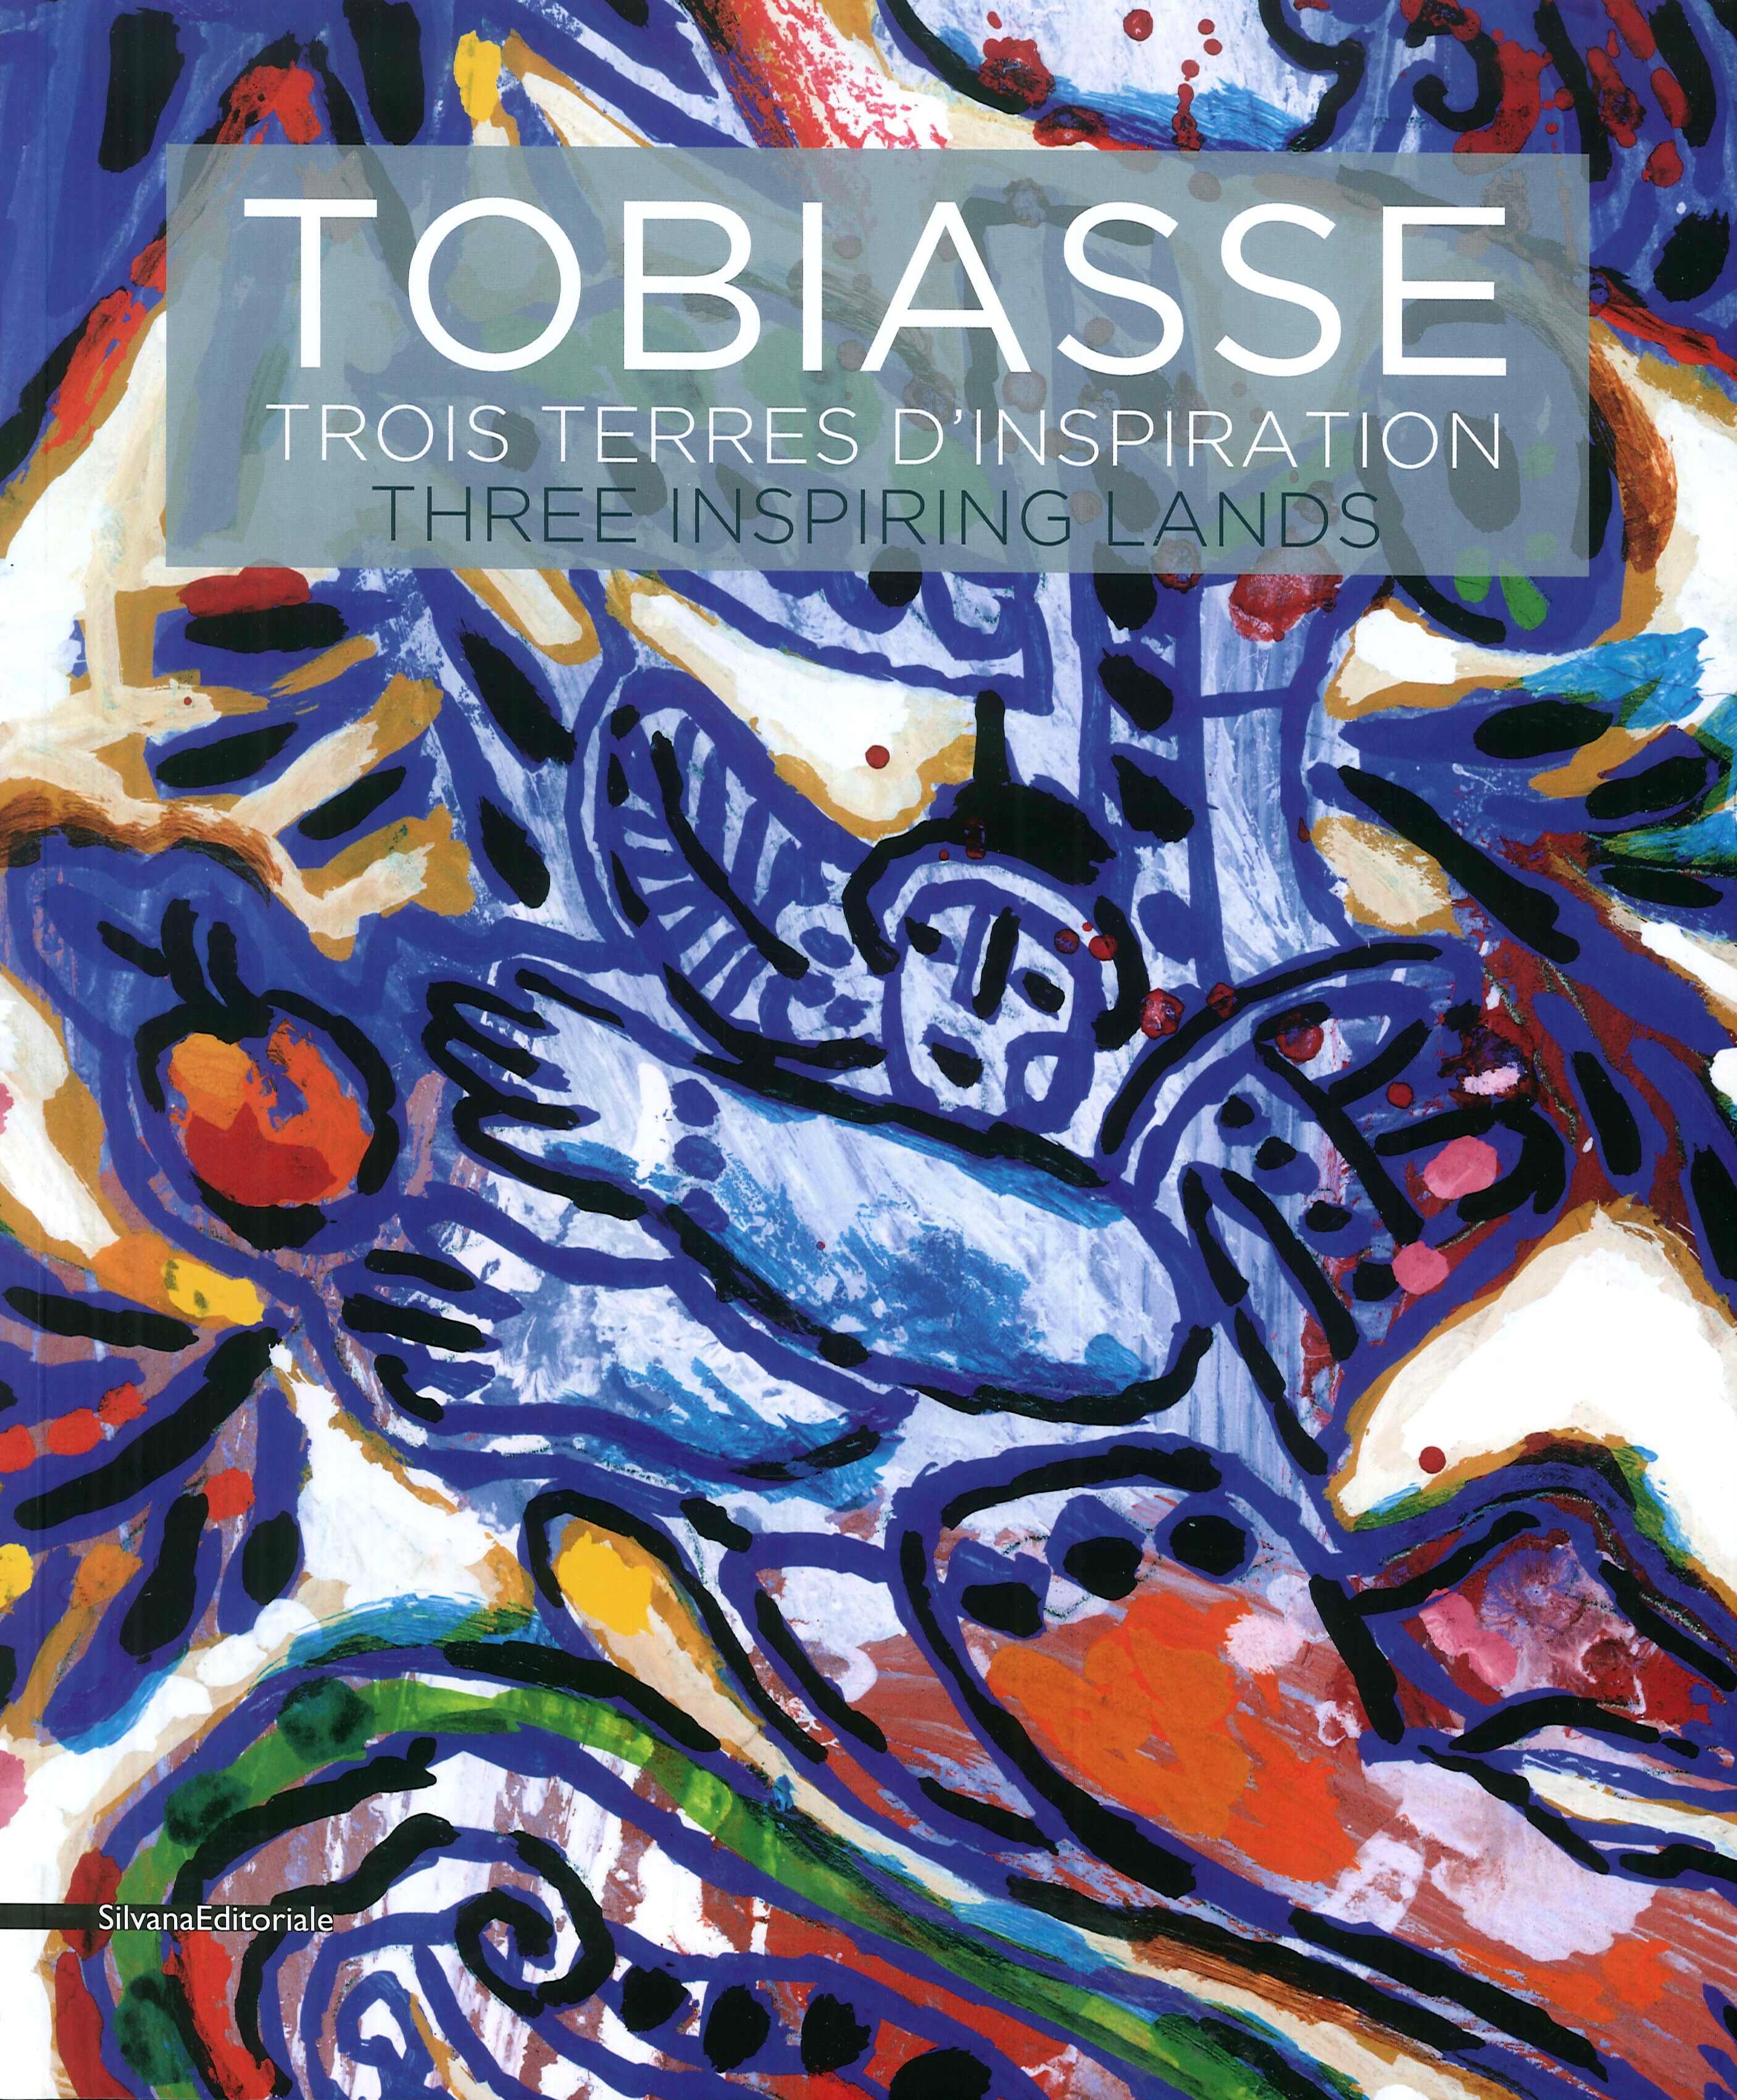 Tobiasse. Trois terres d'inspiration. Three Inspiring Lands